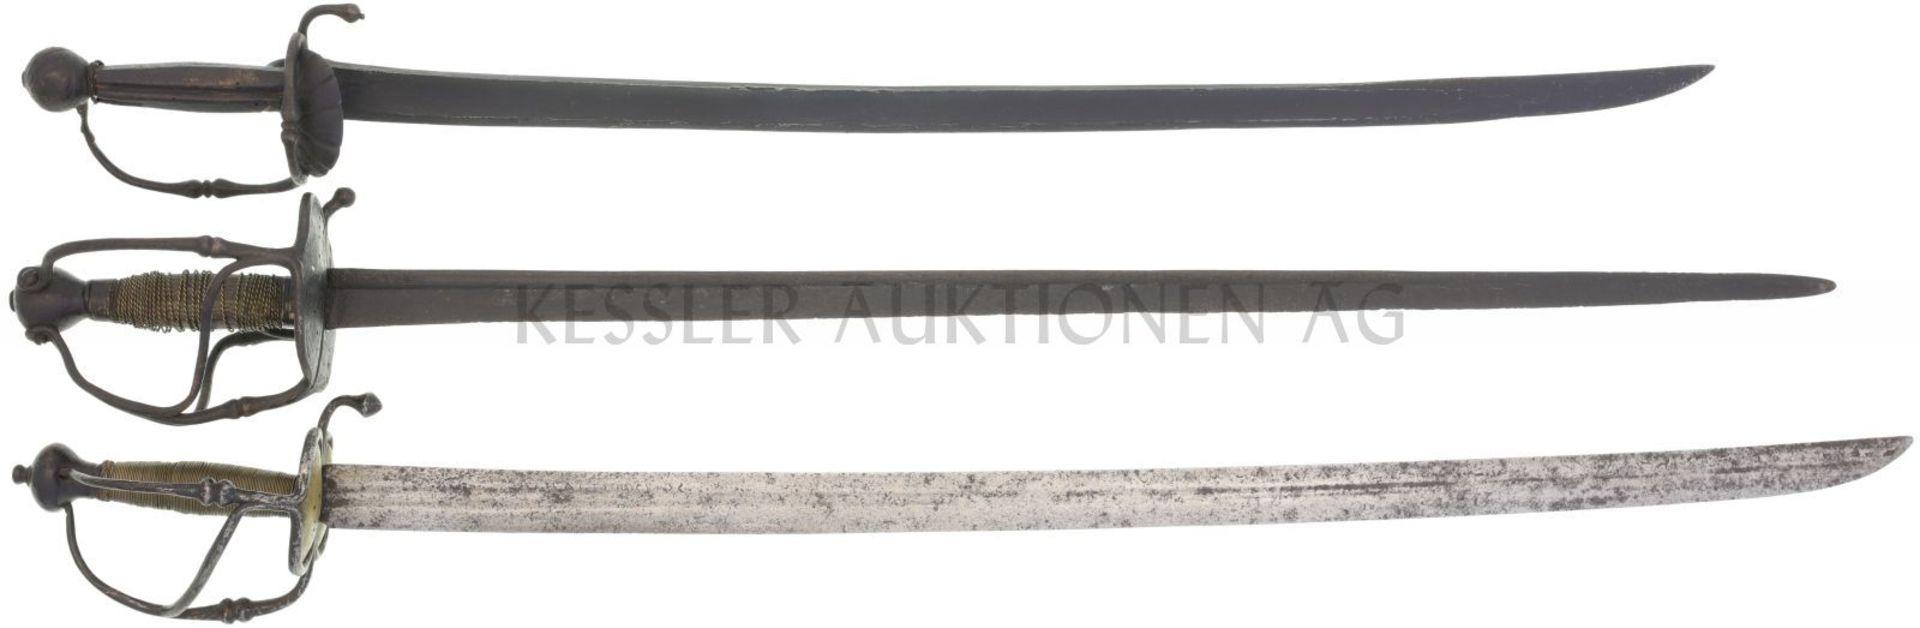 Konvolut von 3 Säbeln 18.Jh. 1. Säbel deutsch, Ende 17.Jh., TL 850mm, KL 705, Rückenklinge mit